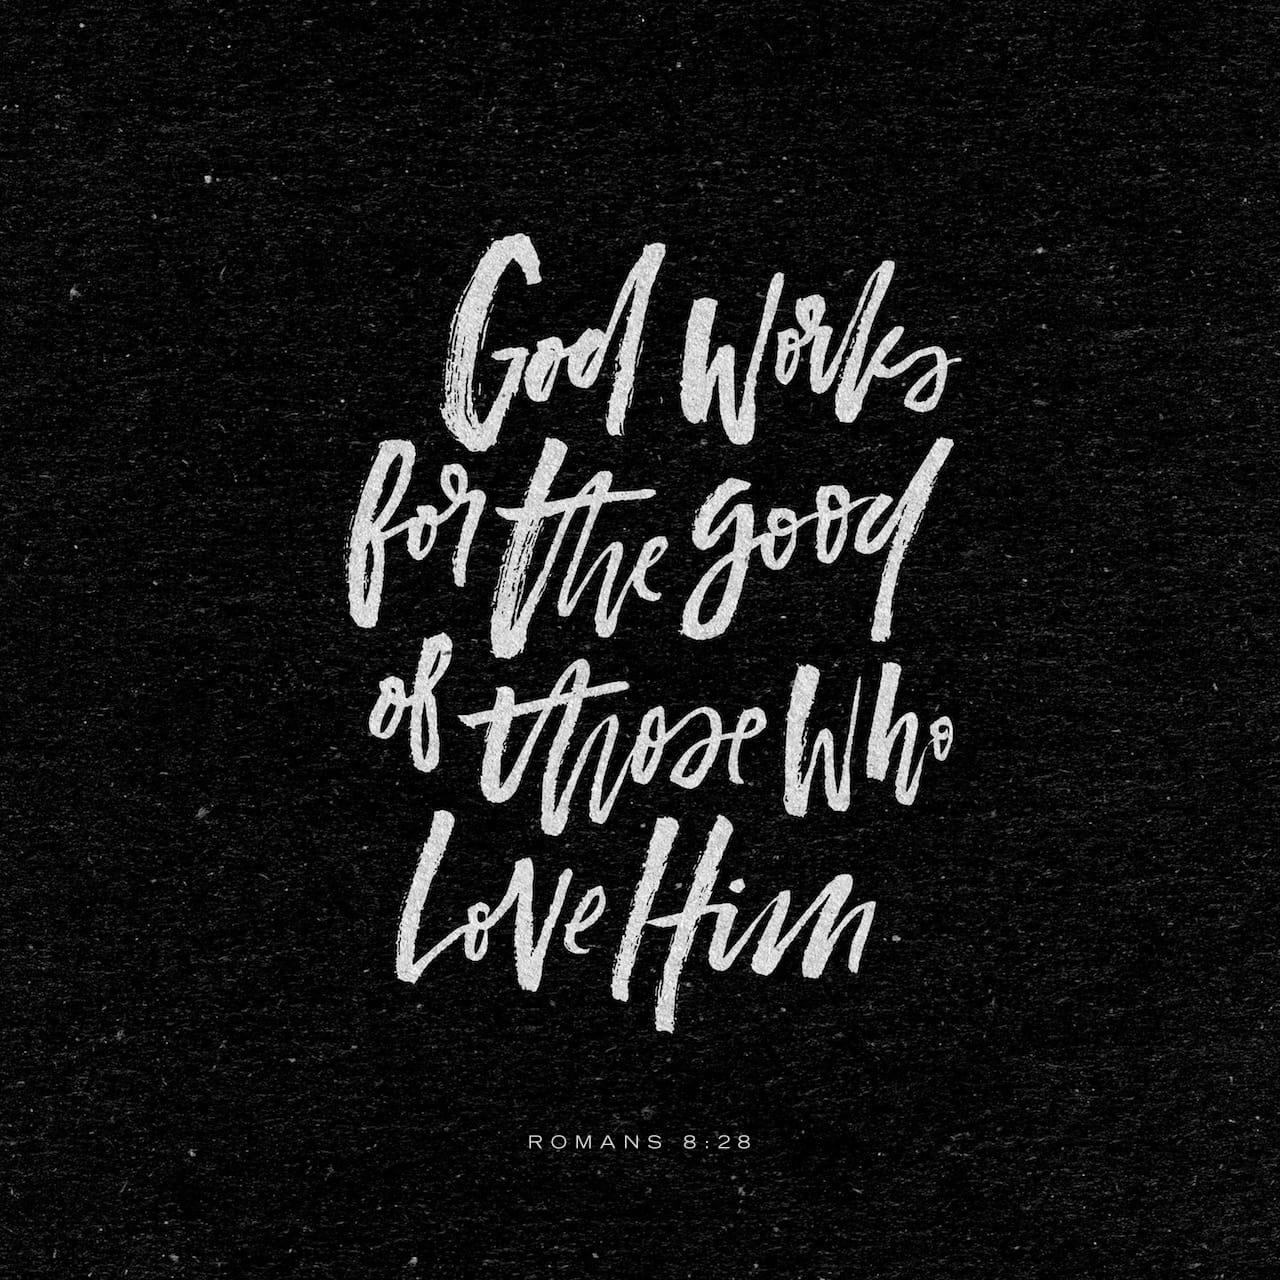 www.bible.com